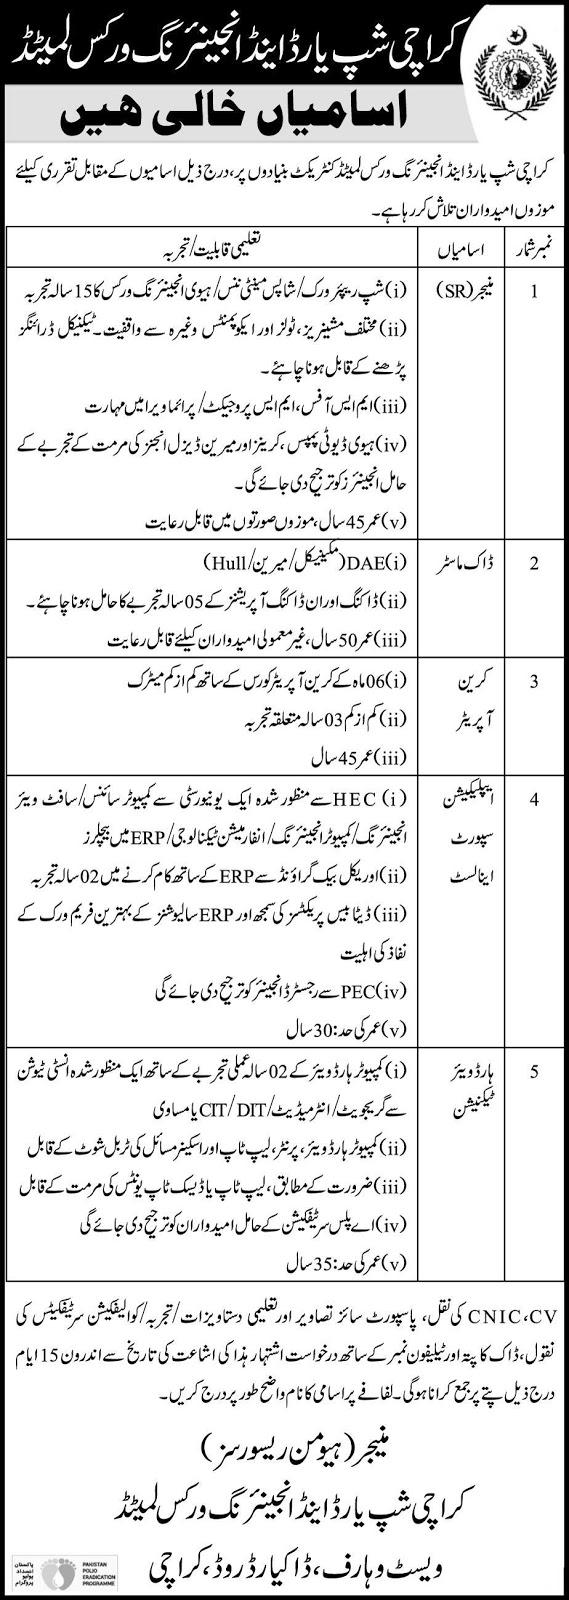 Karachi Shipyard Engineering & Works Limited Jobs 2019 Latest